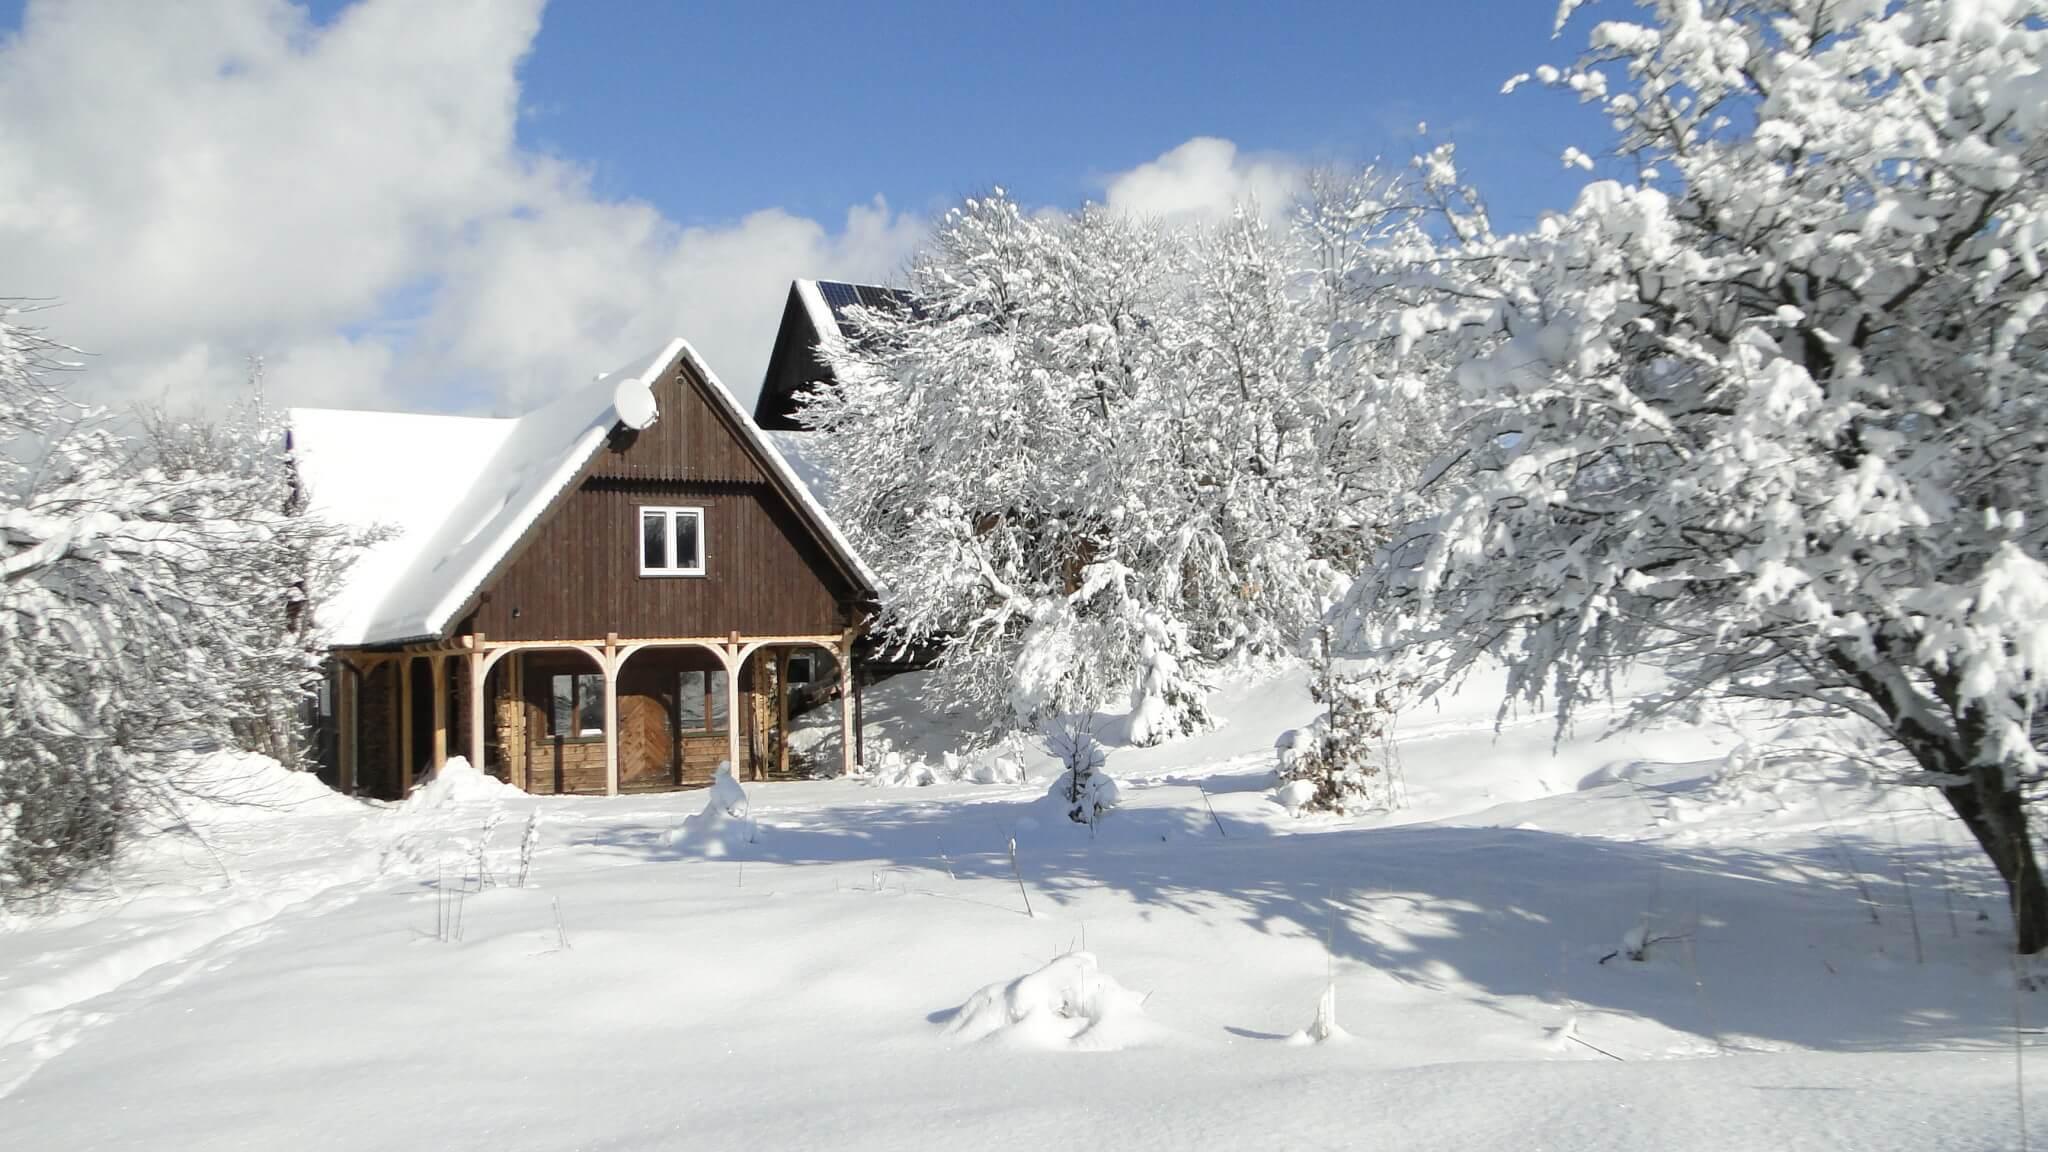 Lutowa zima - śnieżna i mroźna 9